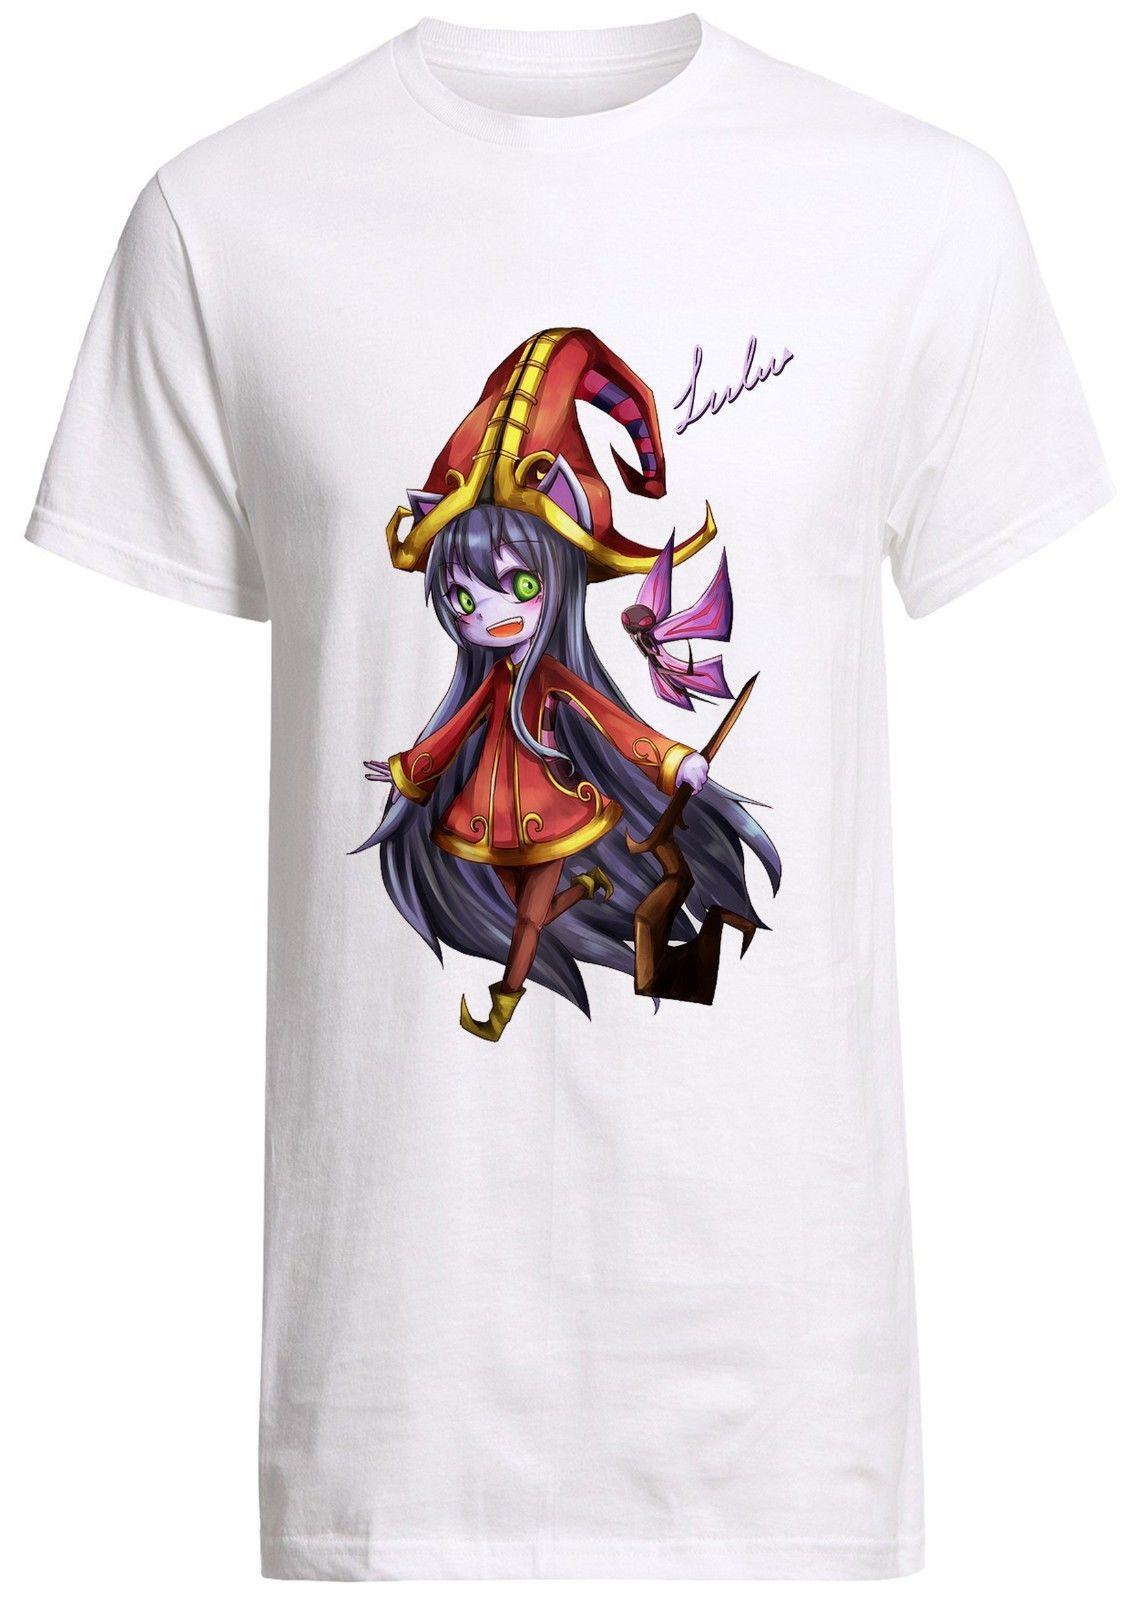 7ec15ce58d Compre League Of Legends Lulu Camiseta Yasuo Gnar Jax Ashe Jinx Adc  Mediados De Camiseta Personalizada A  11.17 Del Fashiontshirt